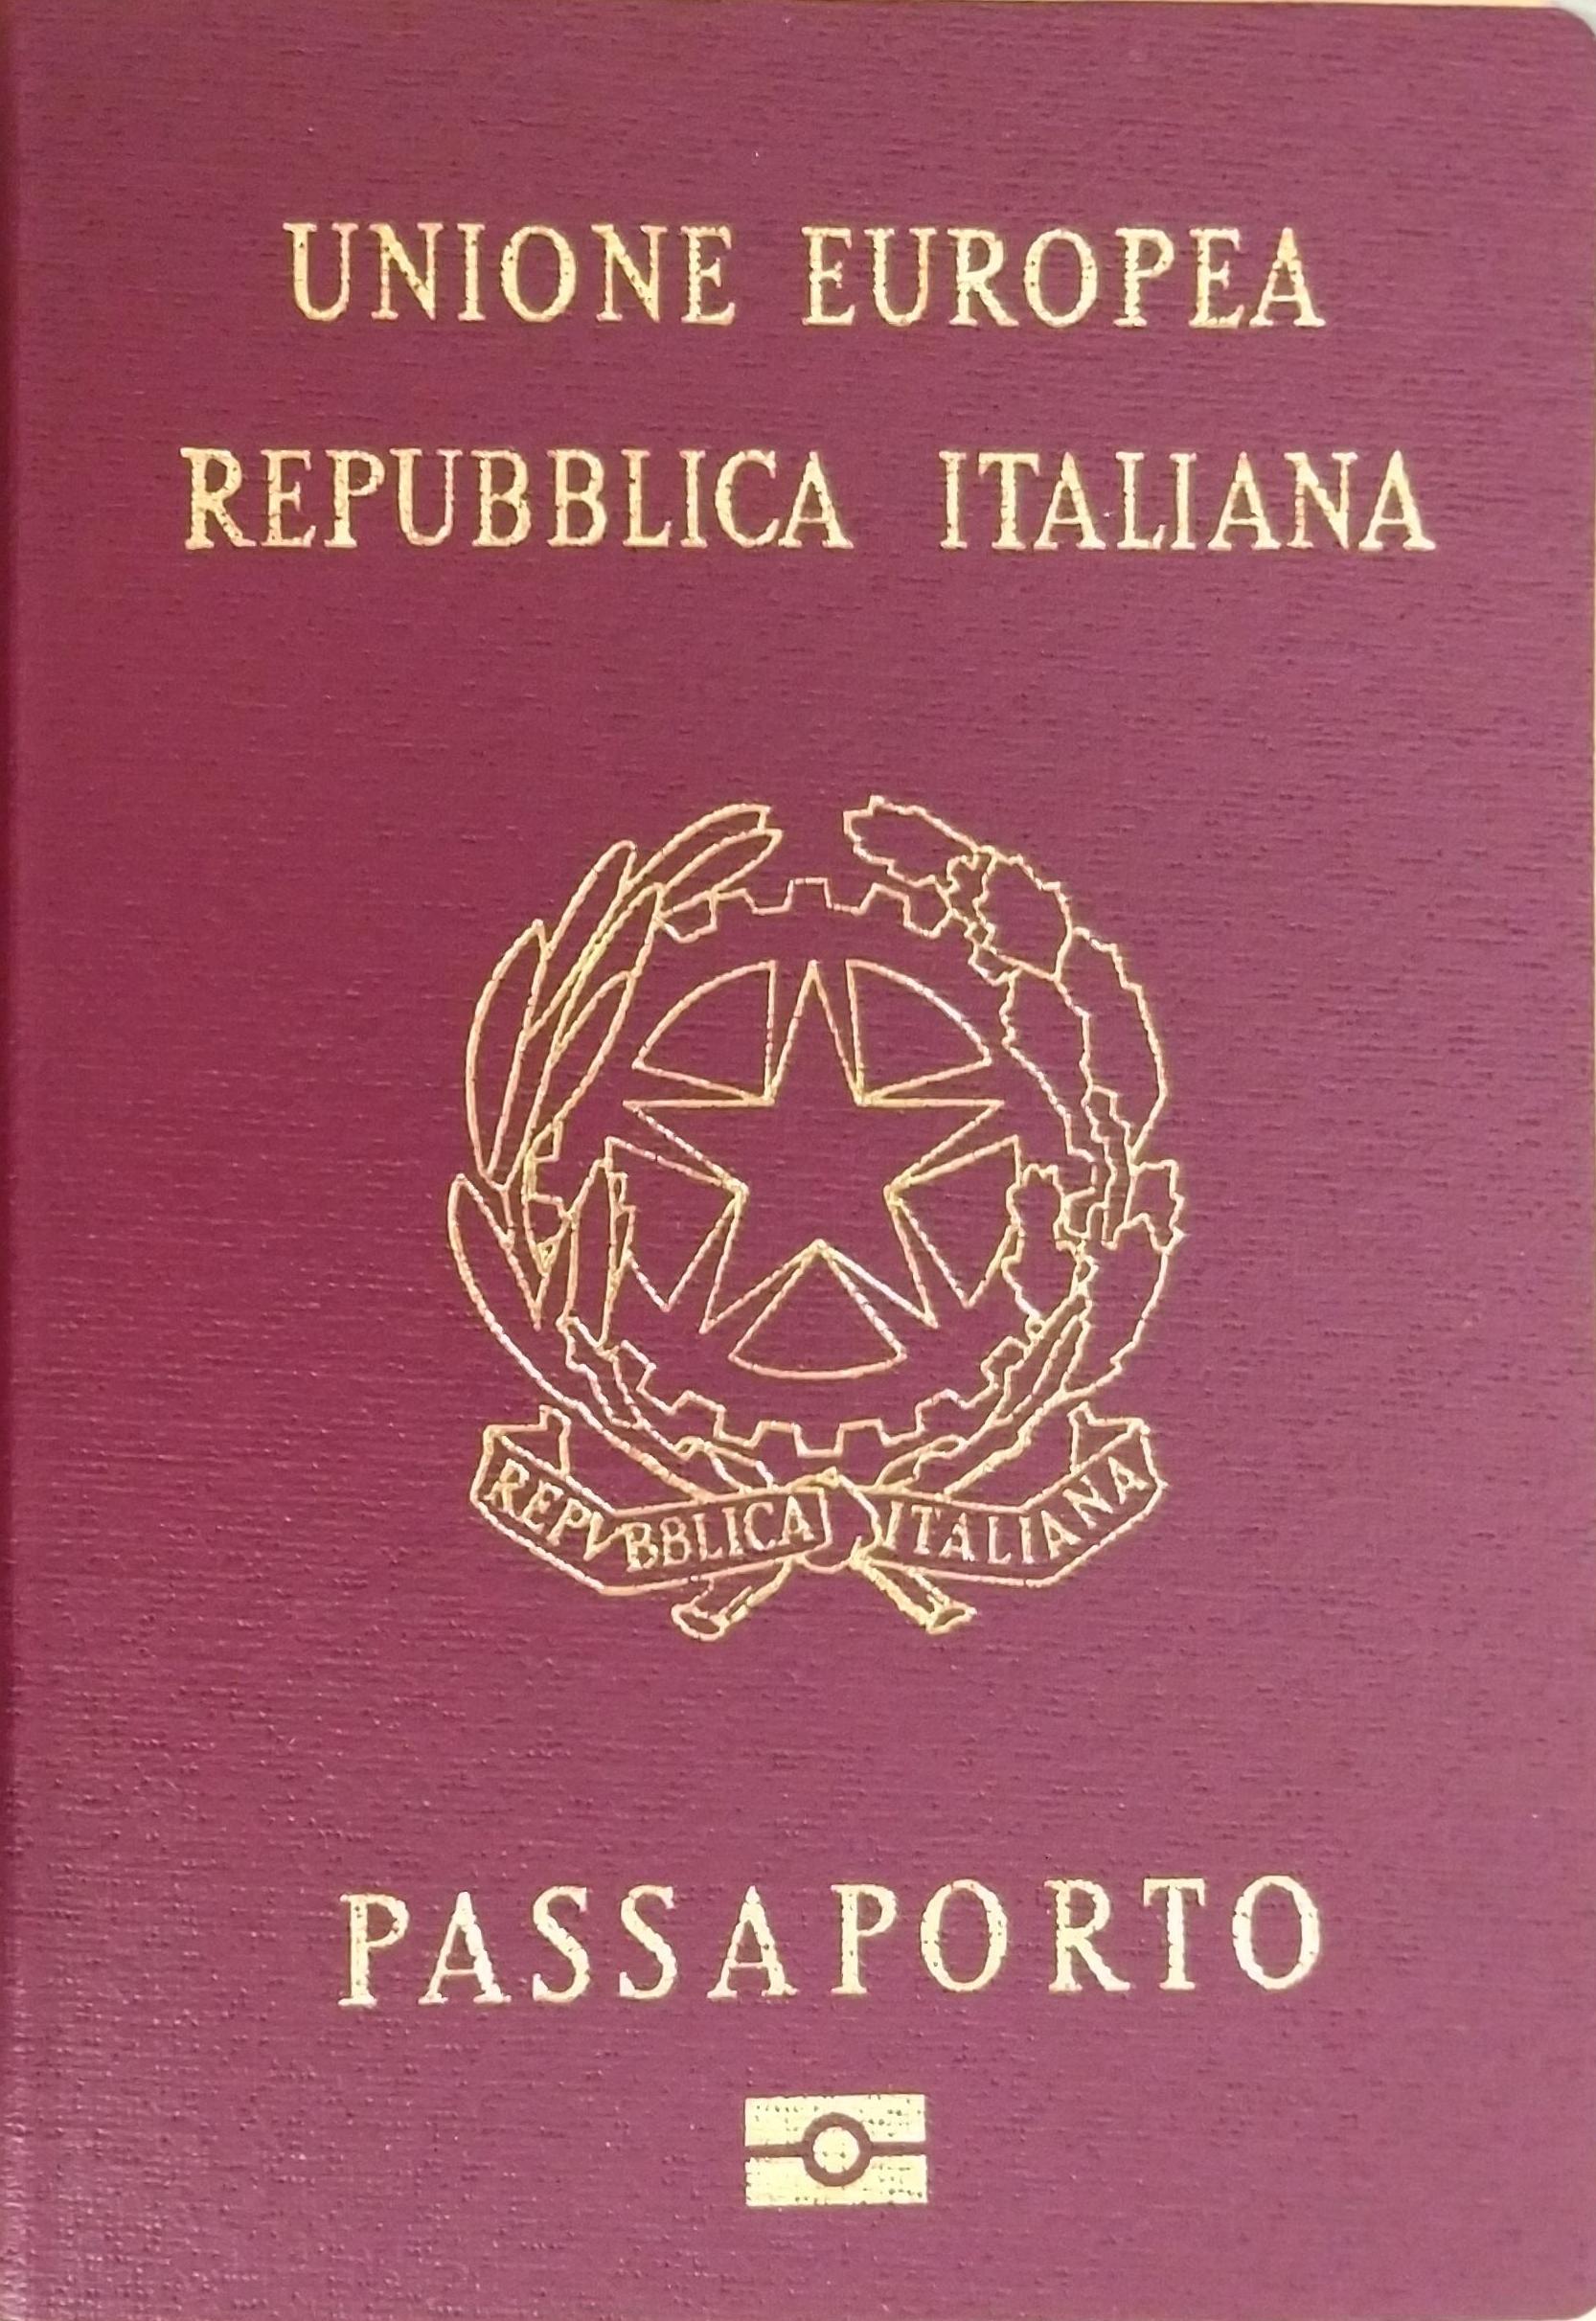 Residency and Citizenship - Italian Passport, Residency, Permisso di Soggorno, Dual Citizenship